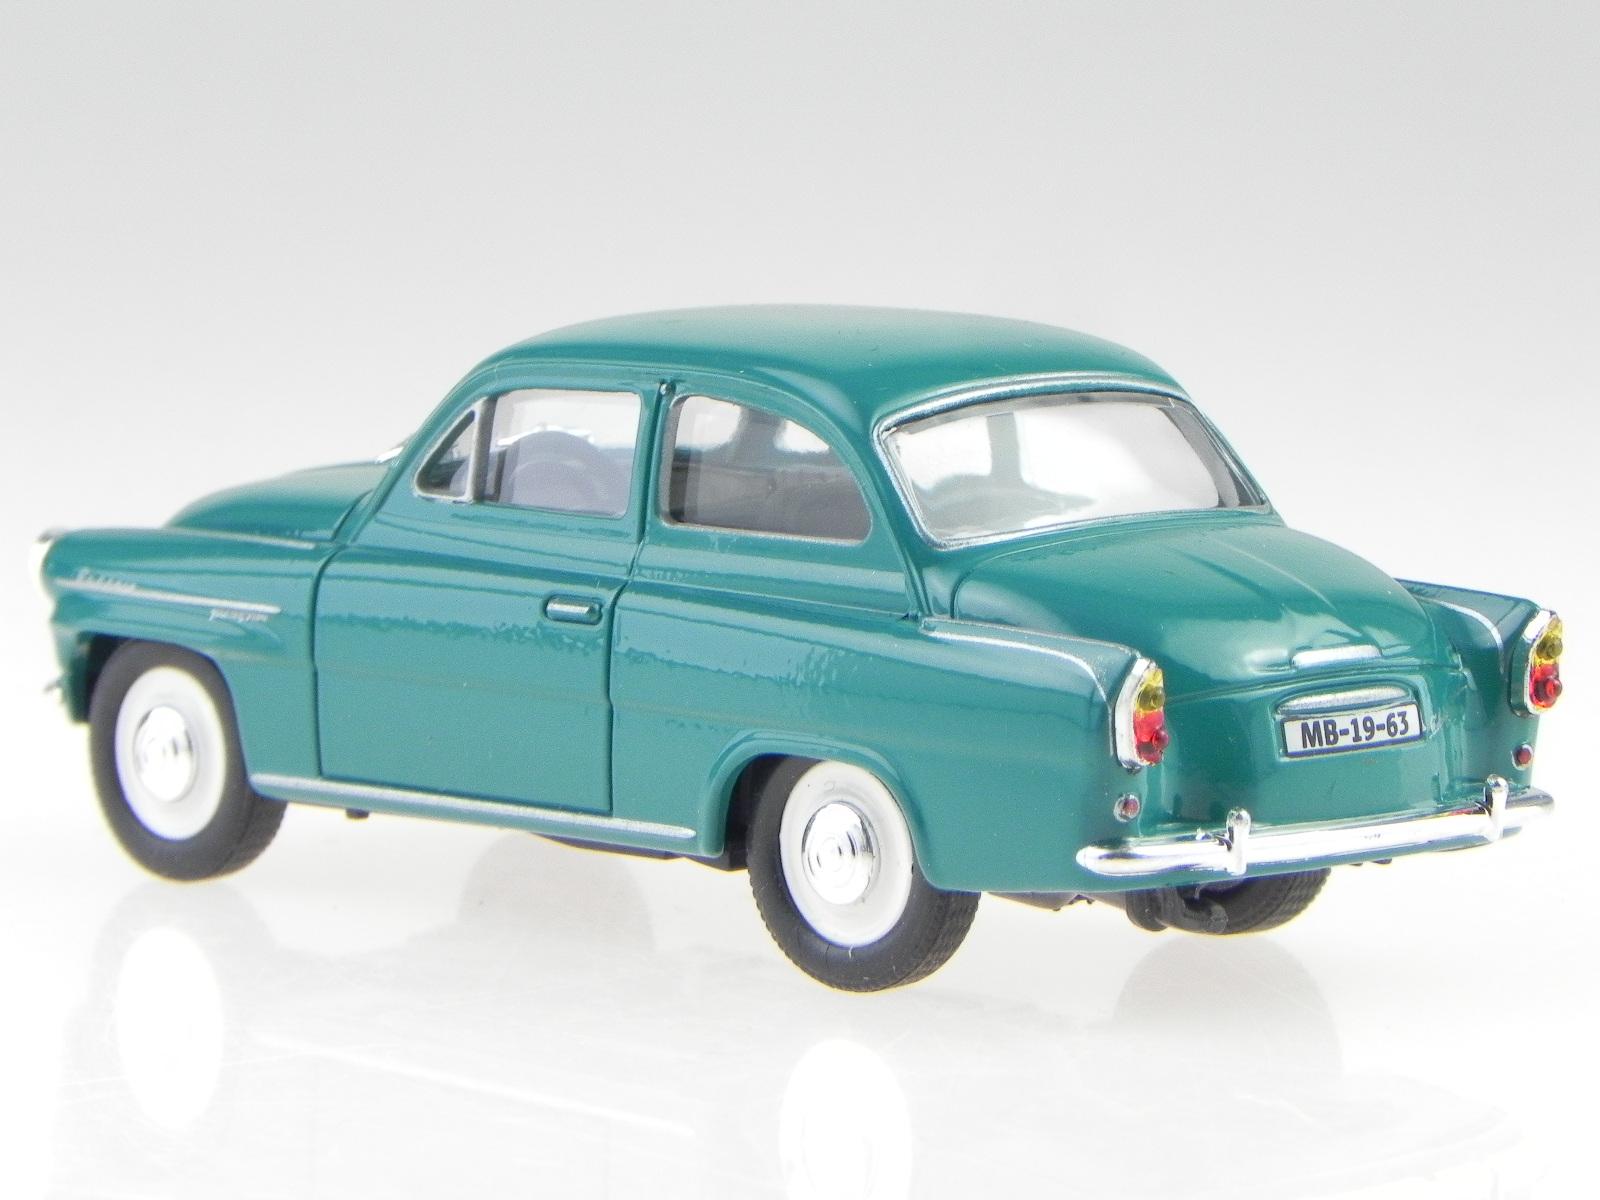 Skoda Octavia 1963 blau grün Modellauto 143ABS-704LK Abrex 1:43